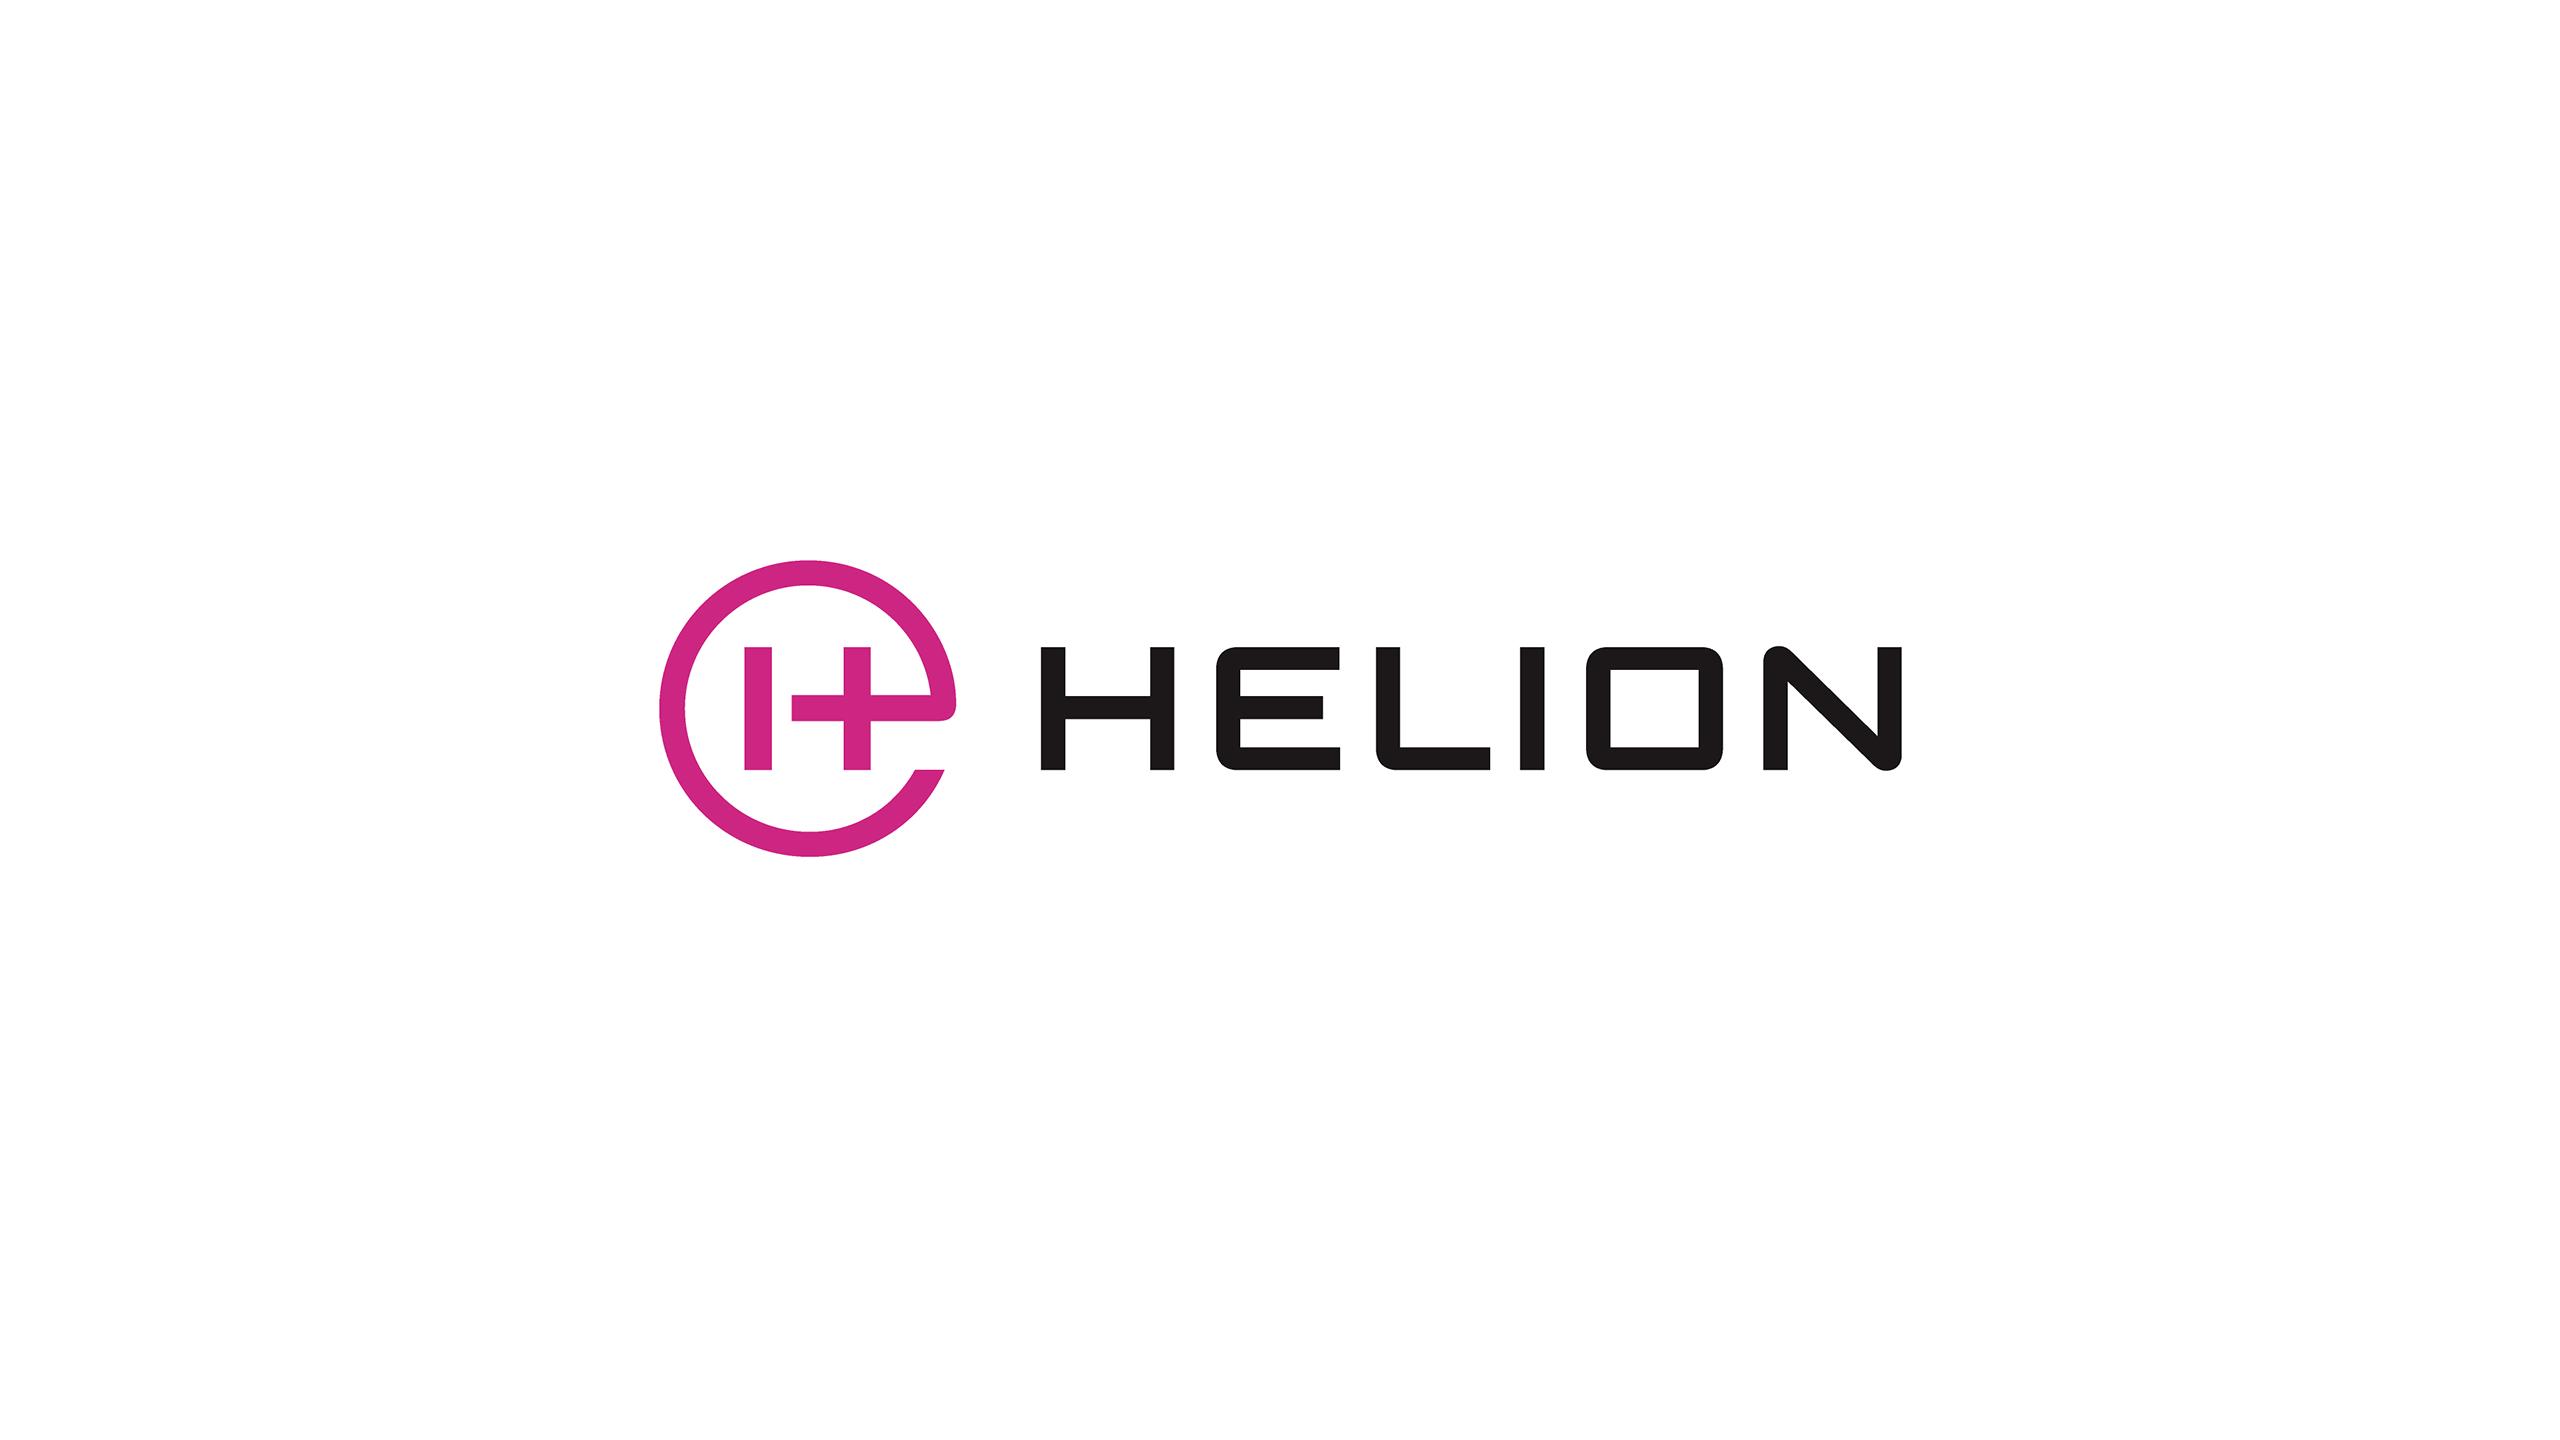 Helion Lockup